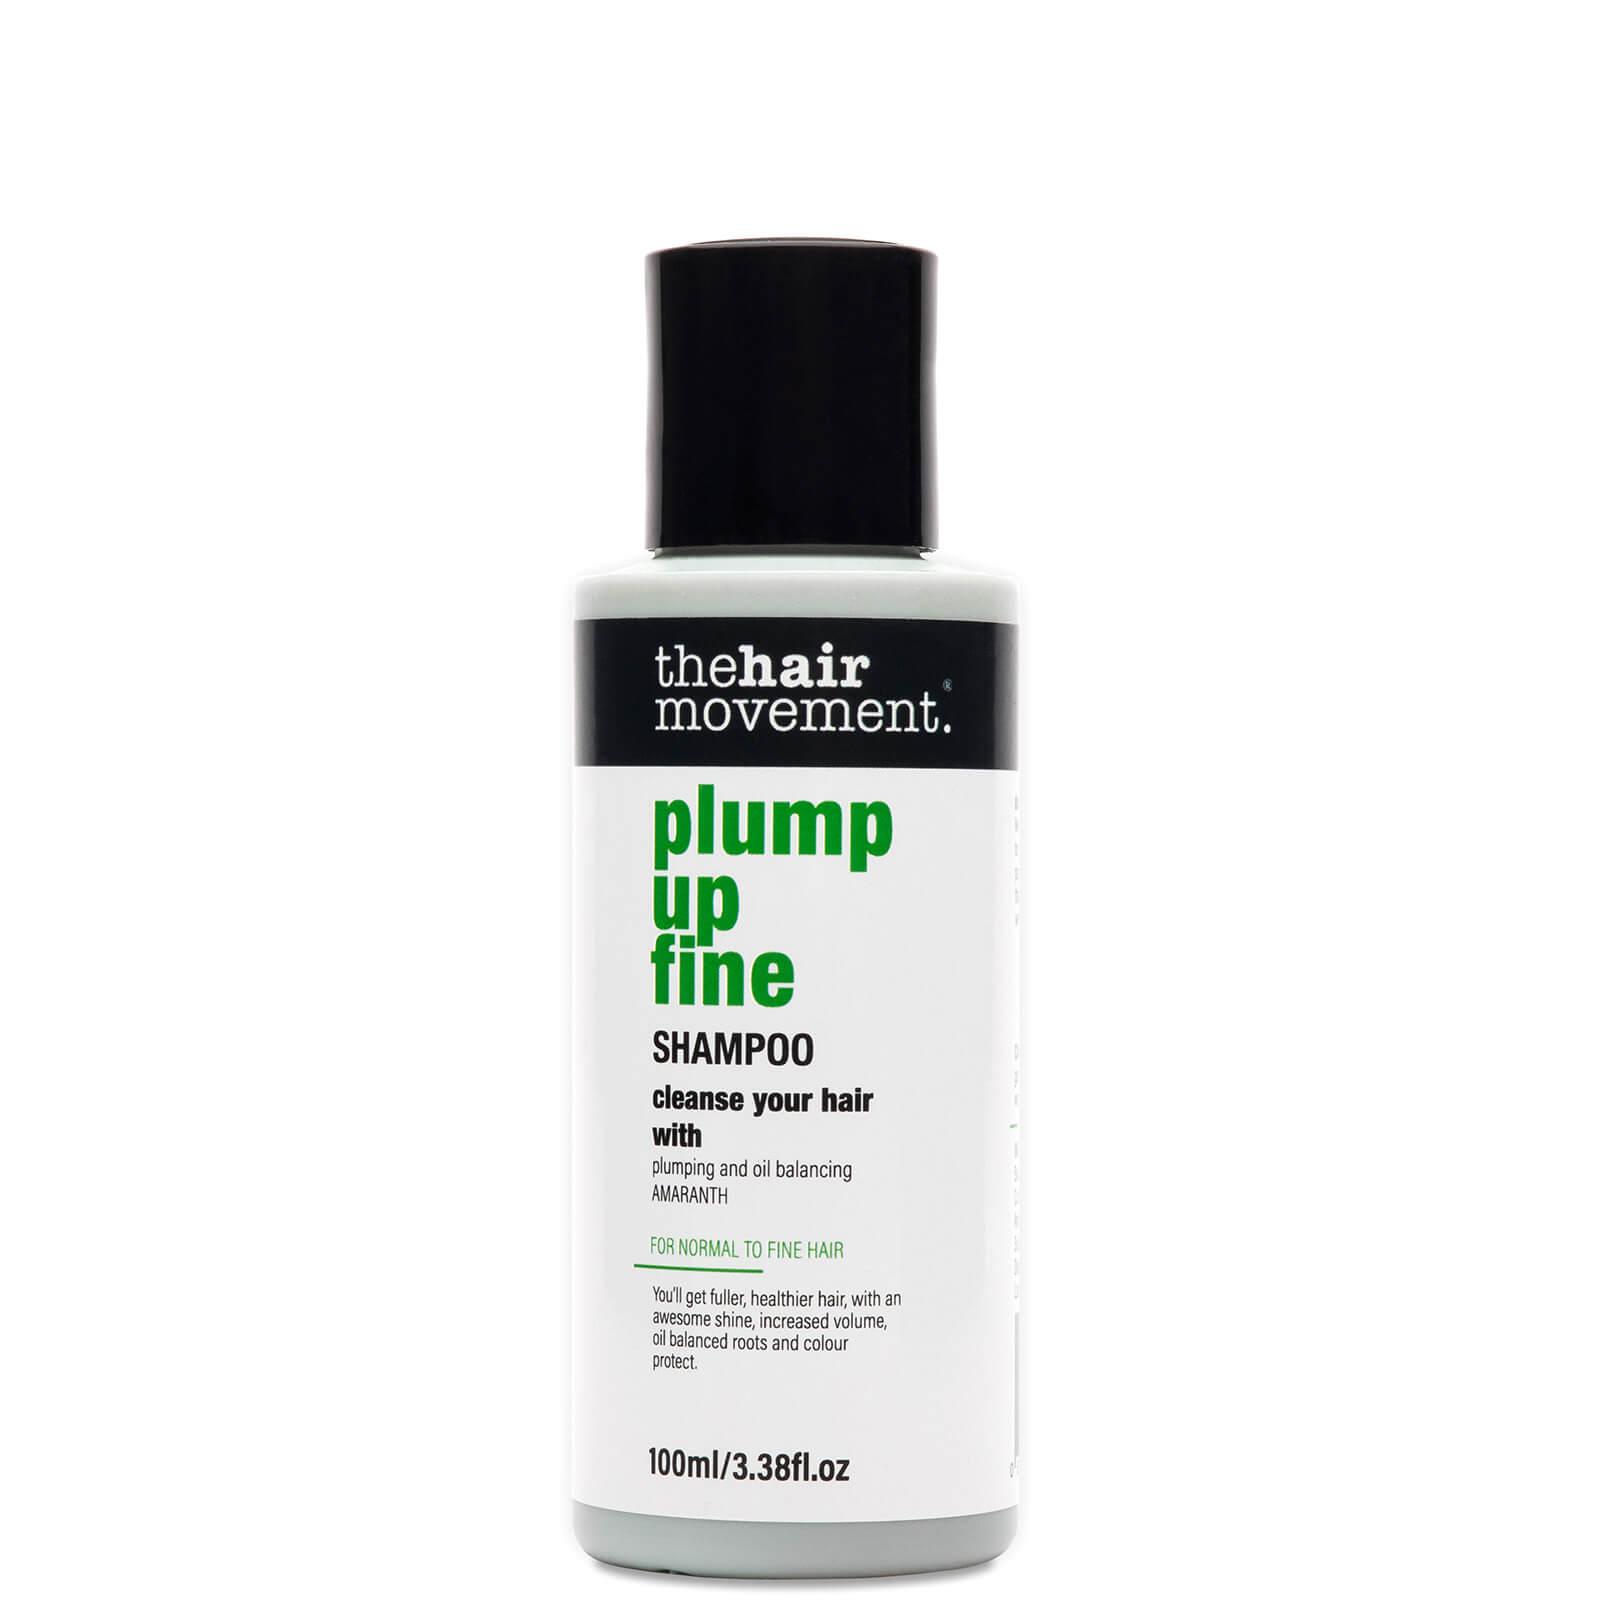 Купить The Hair Movement Plump Up Fine Shampoo 100ml